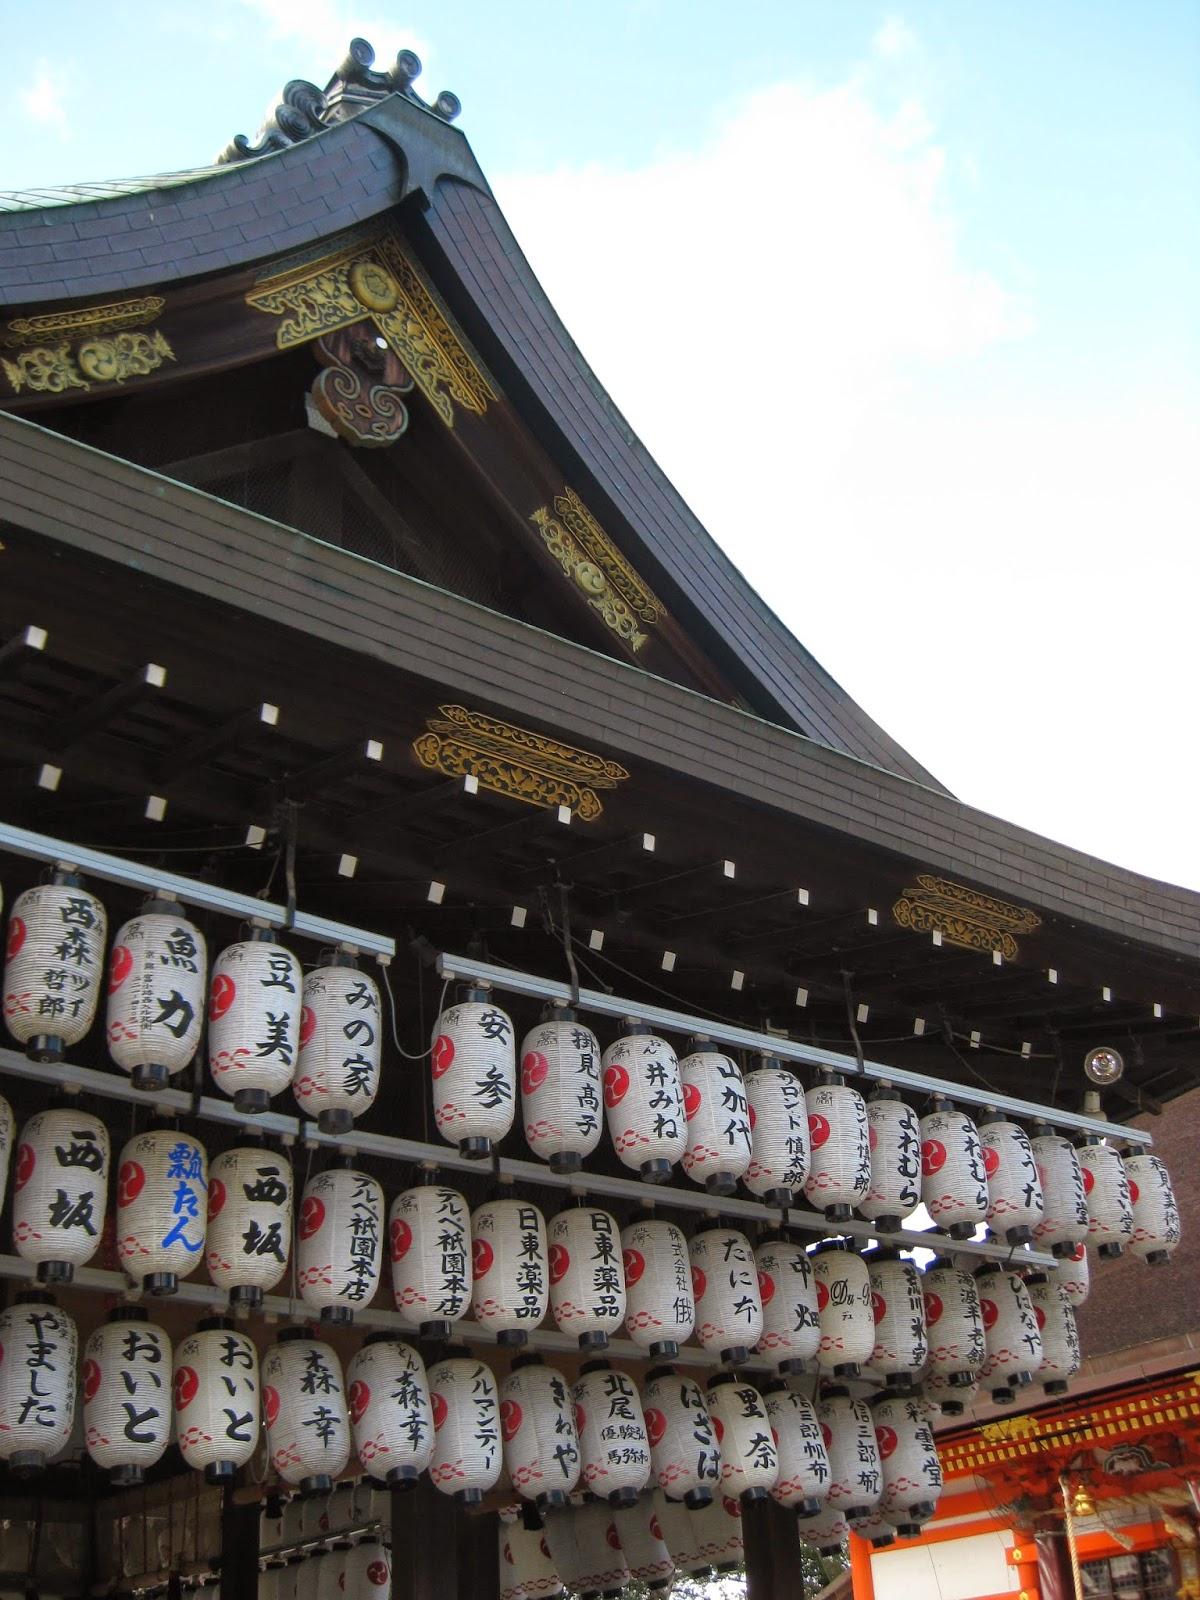 Kyoto - Lanterns